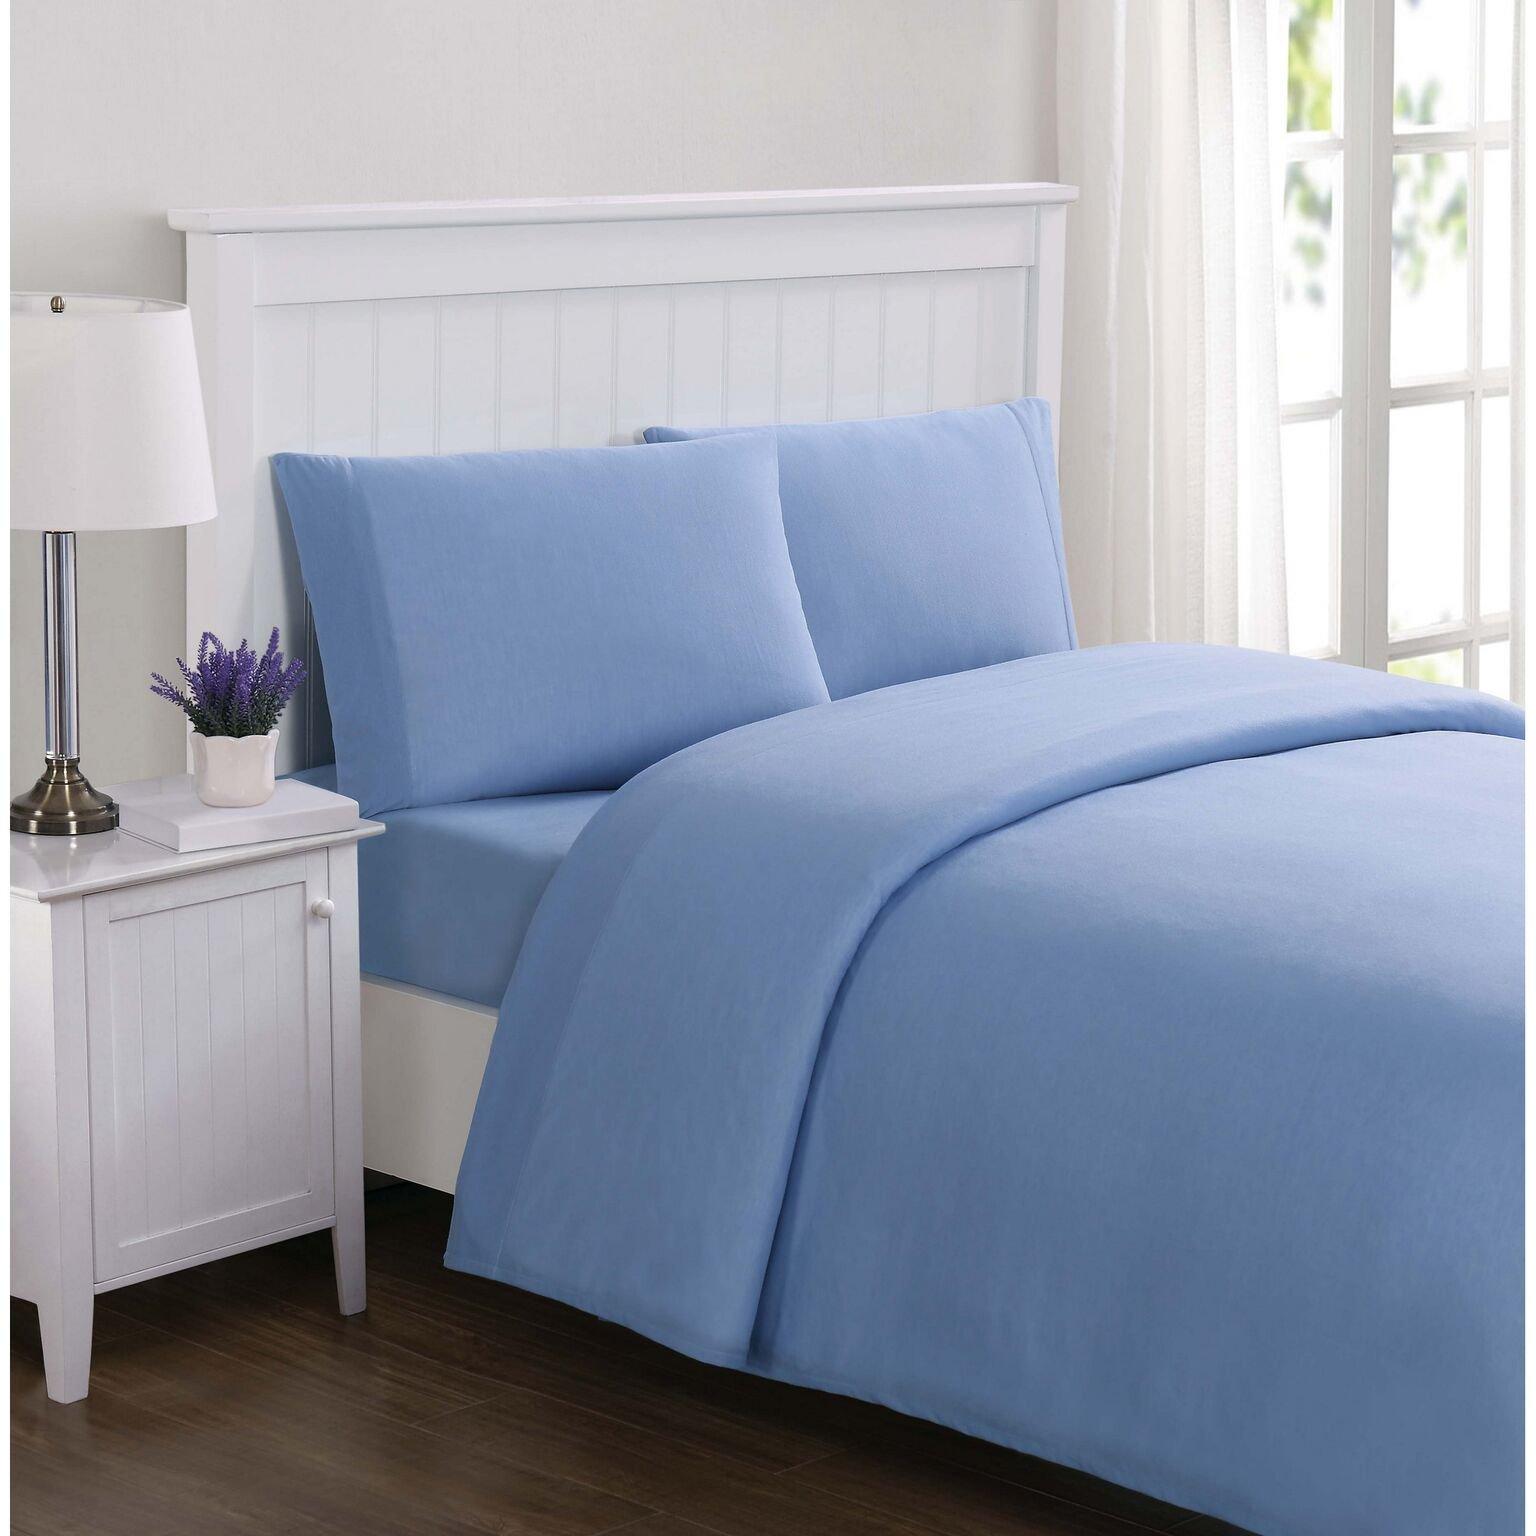 Truly Soft SS2400BLFU-4700 Sheet Set, Full, Blue